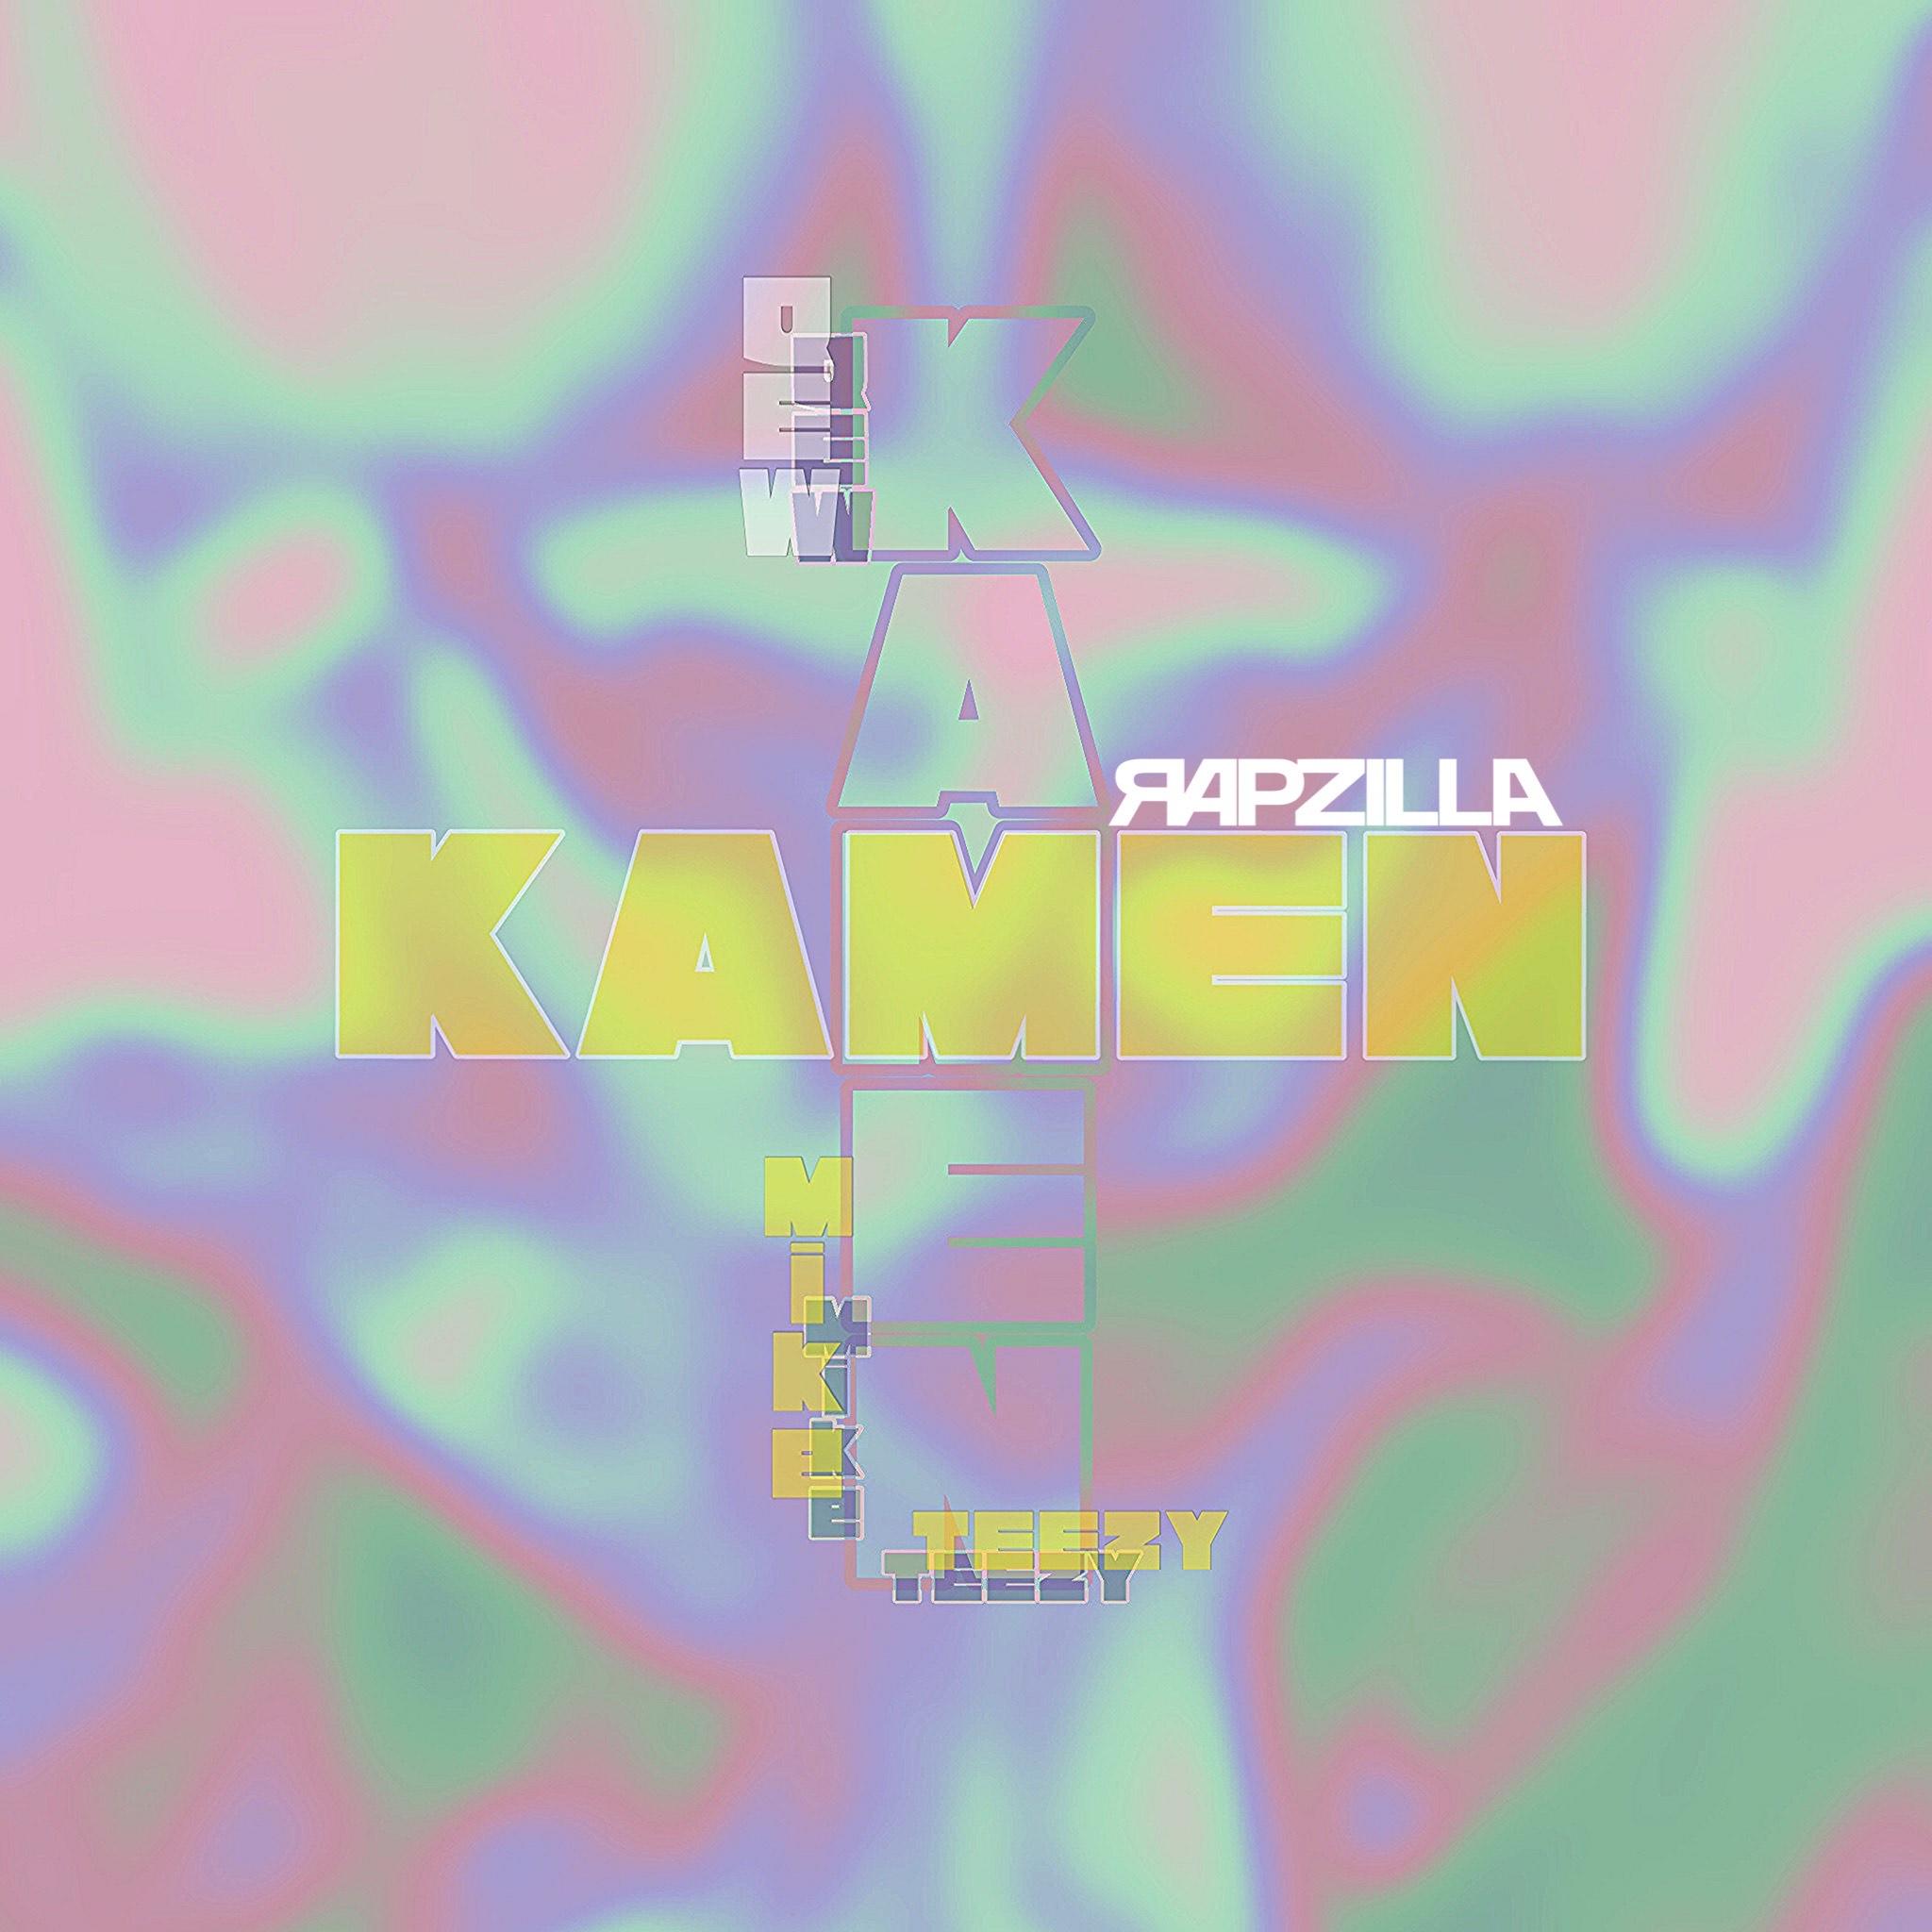 KAMEN (feat. Mike Teezy) Image